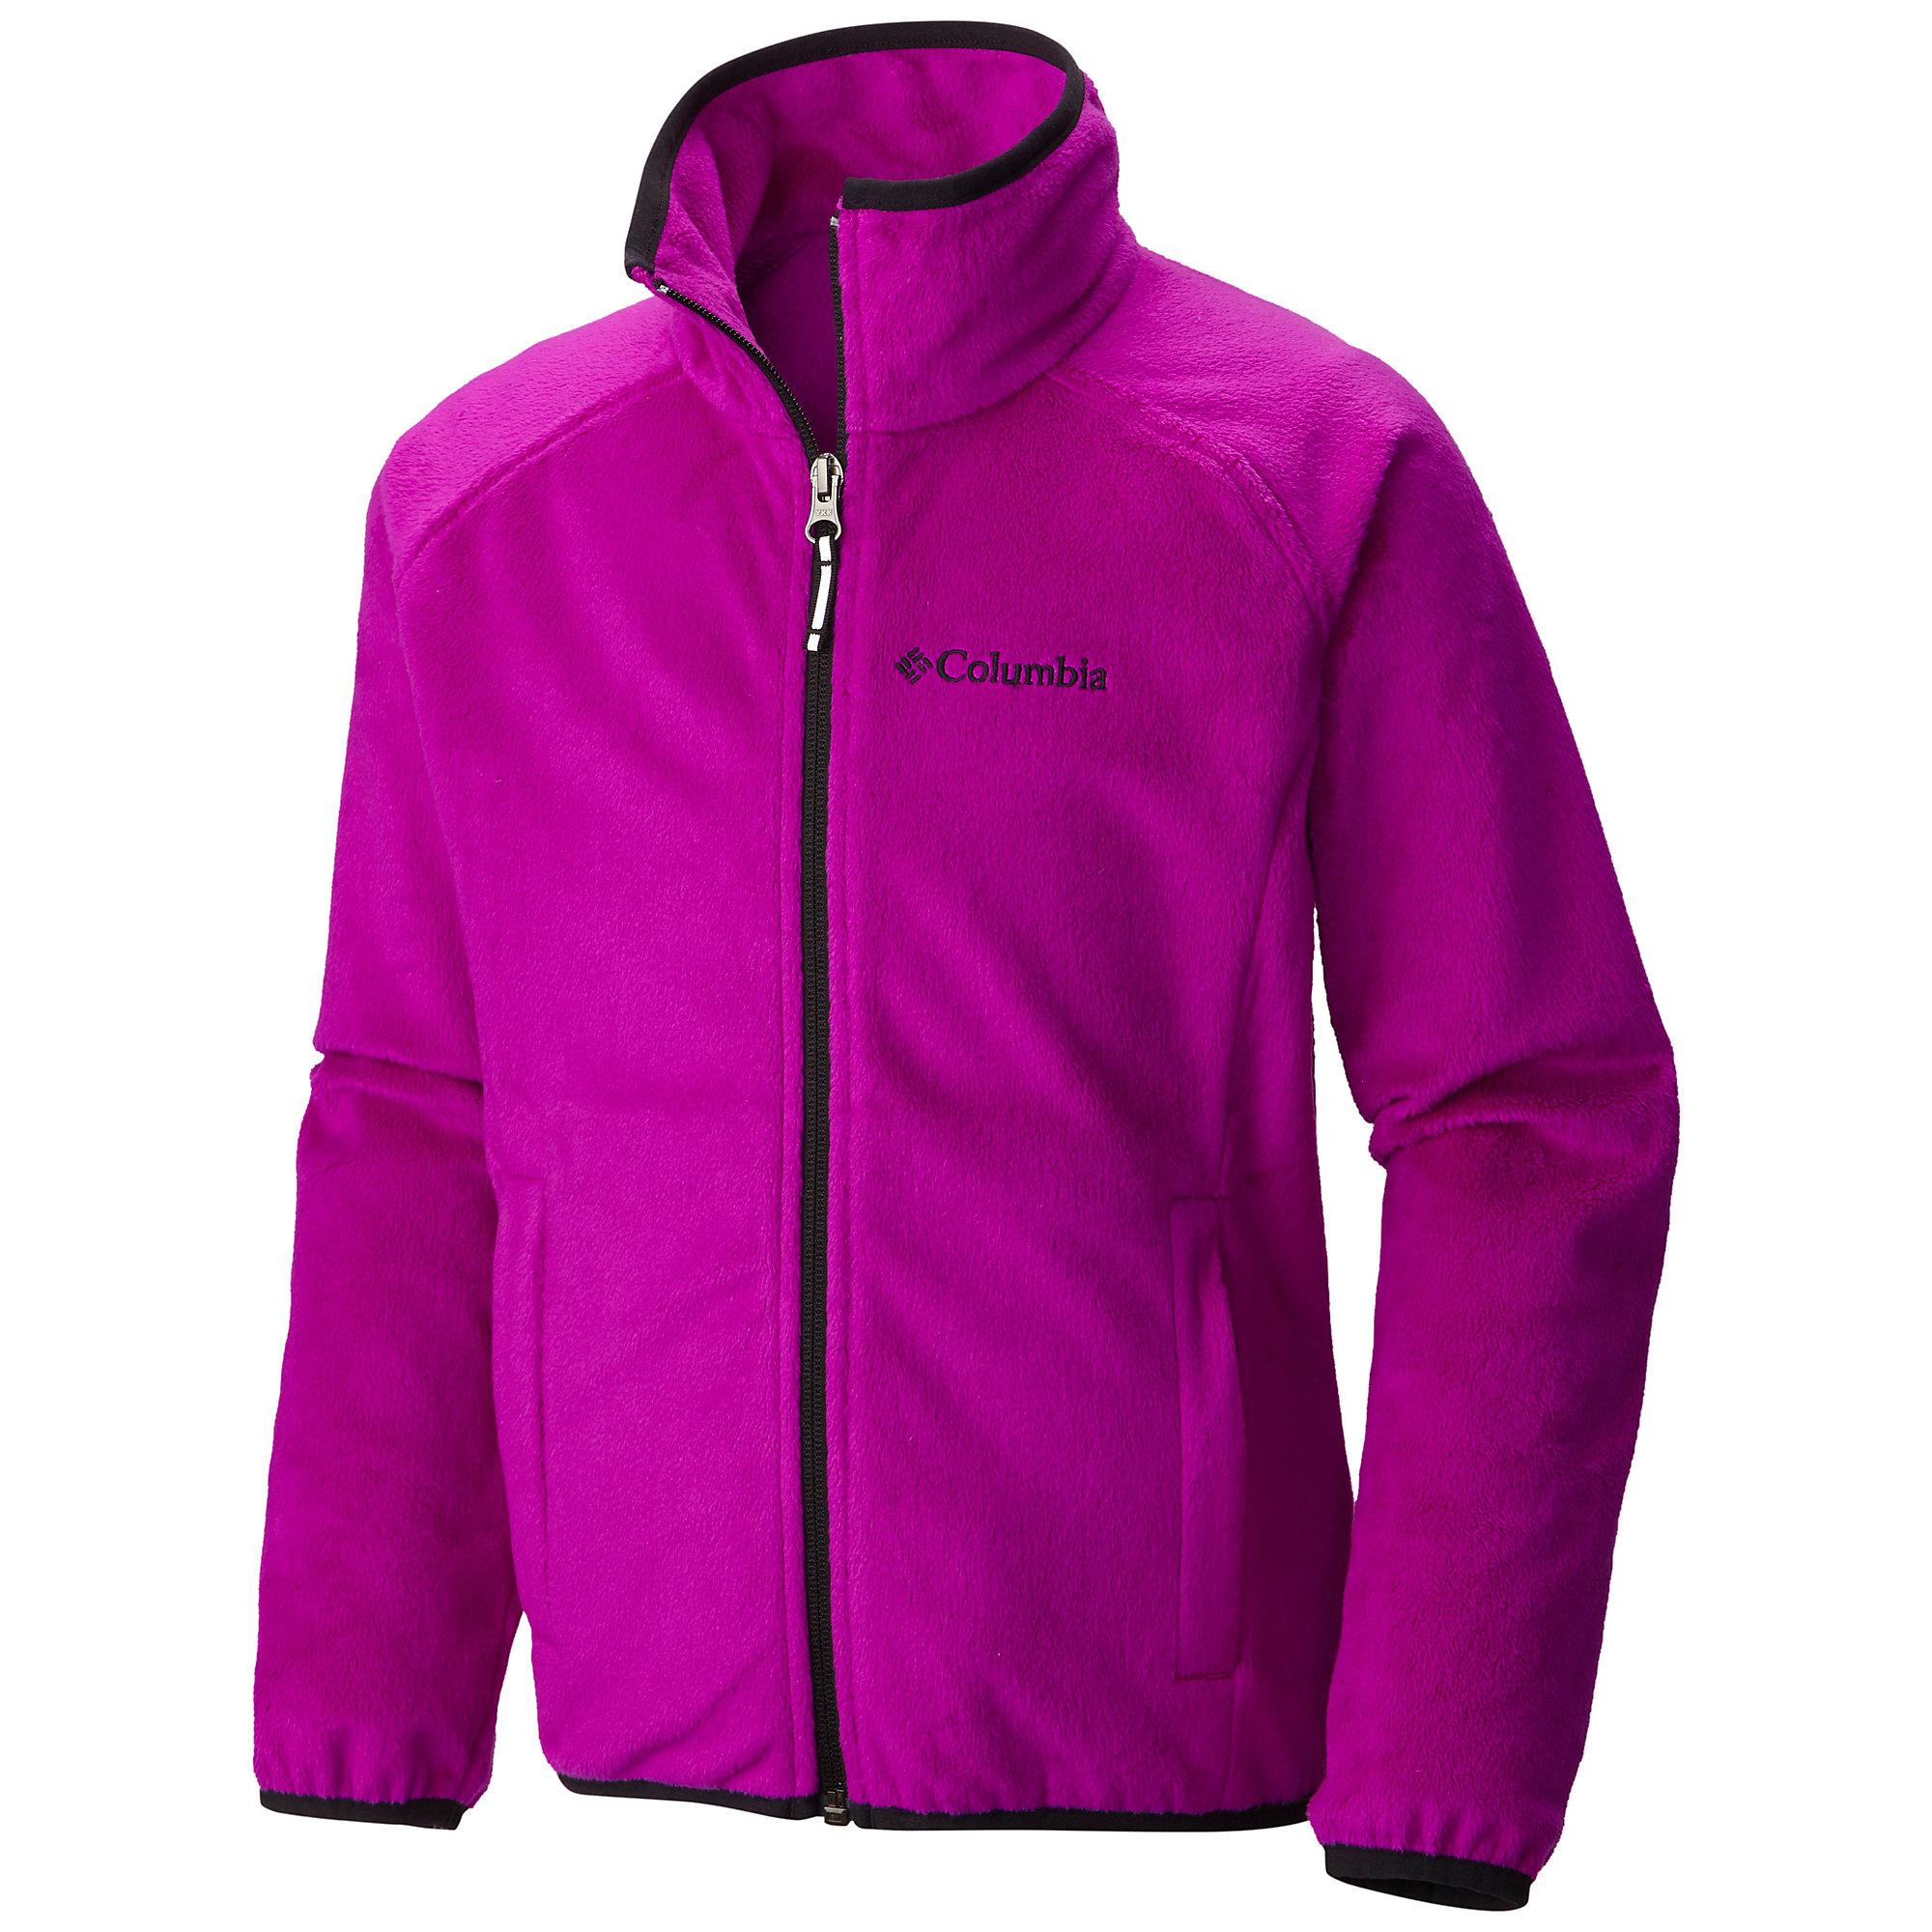 Columbia Pearl Plush Full Zip Jacket